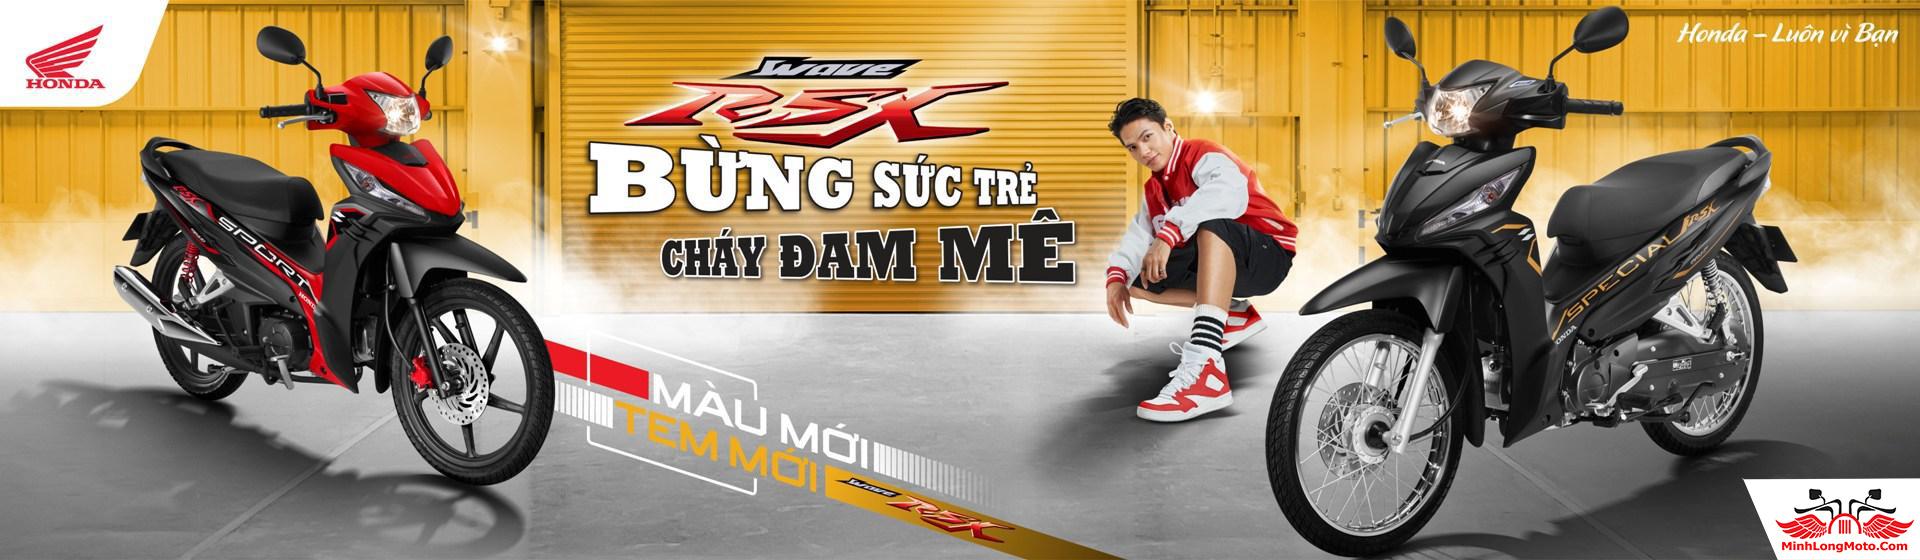 Honda Wave RSX 110 2020